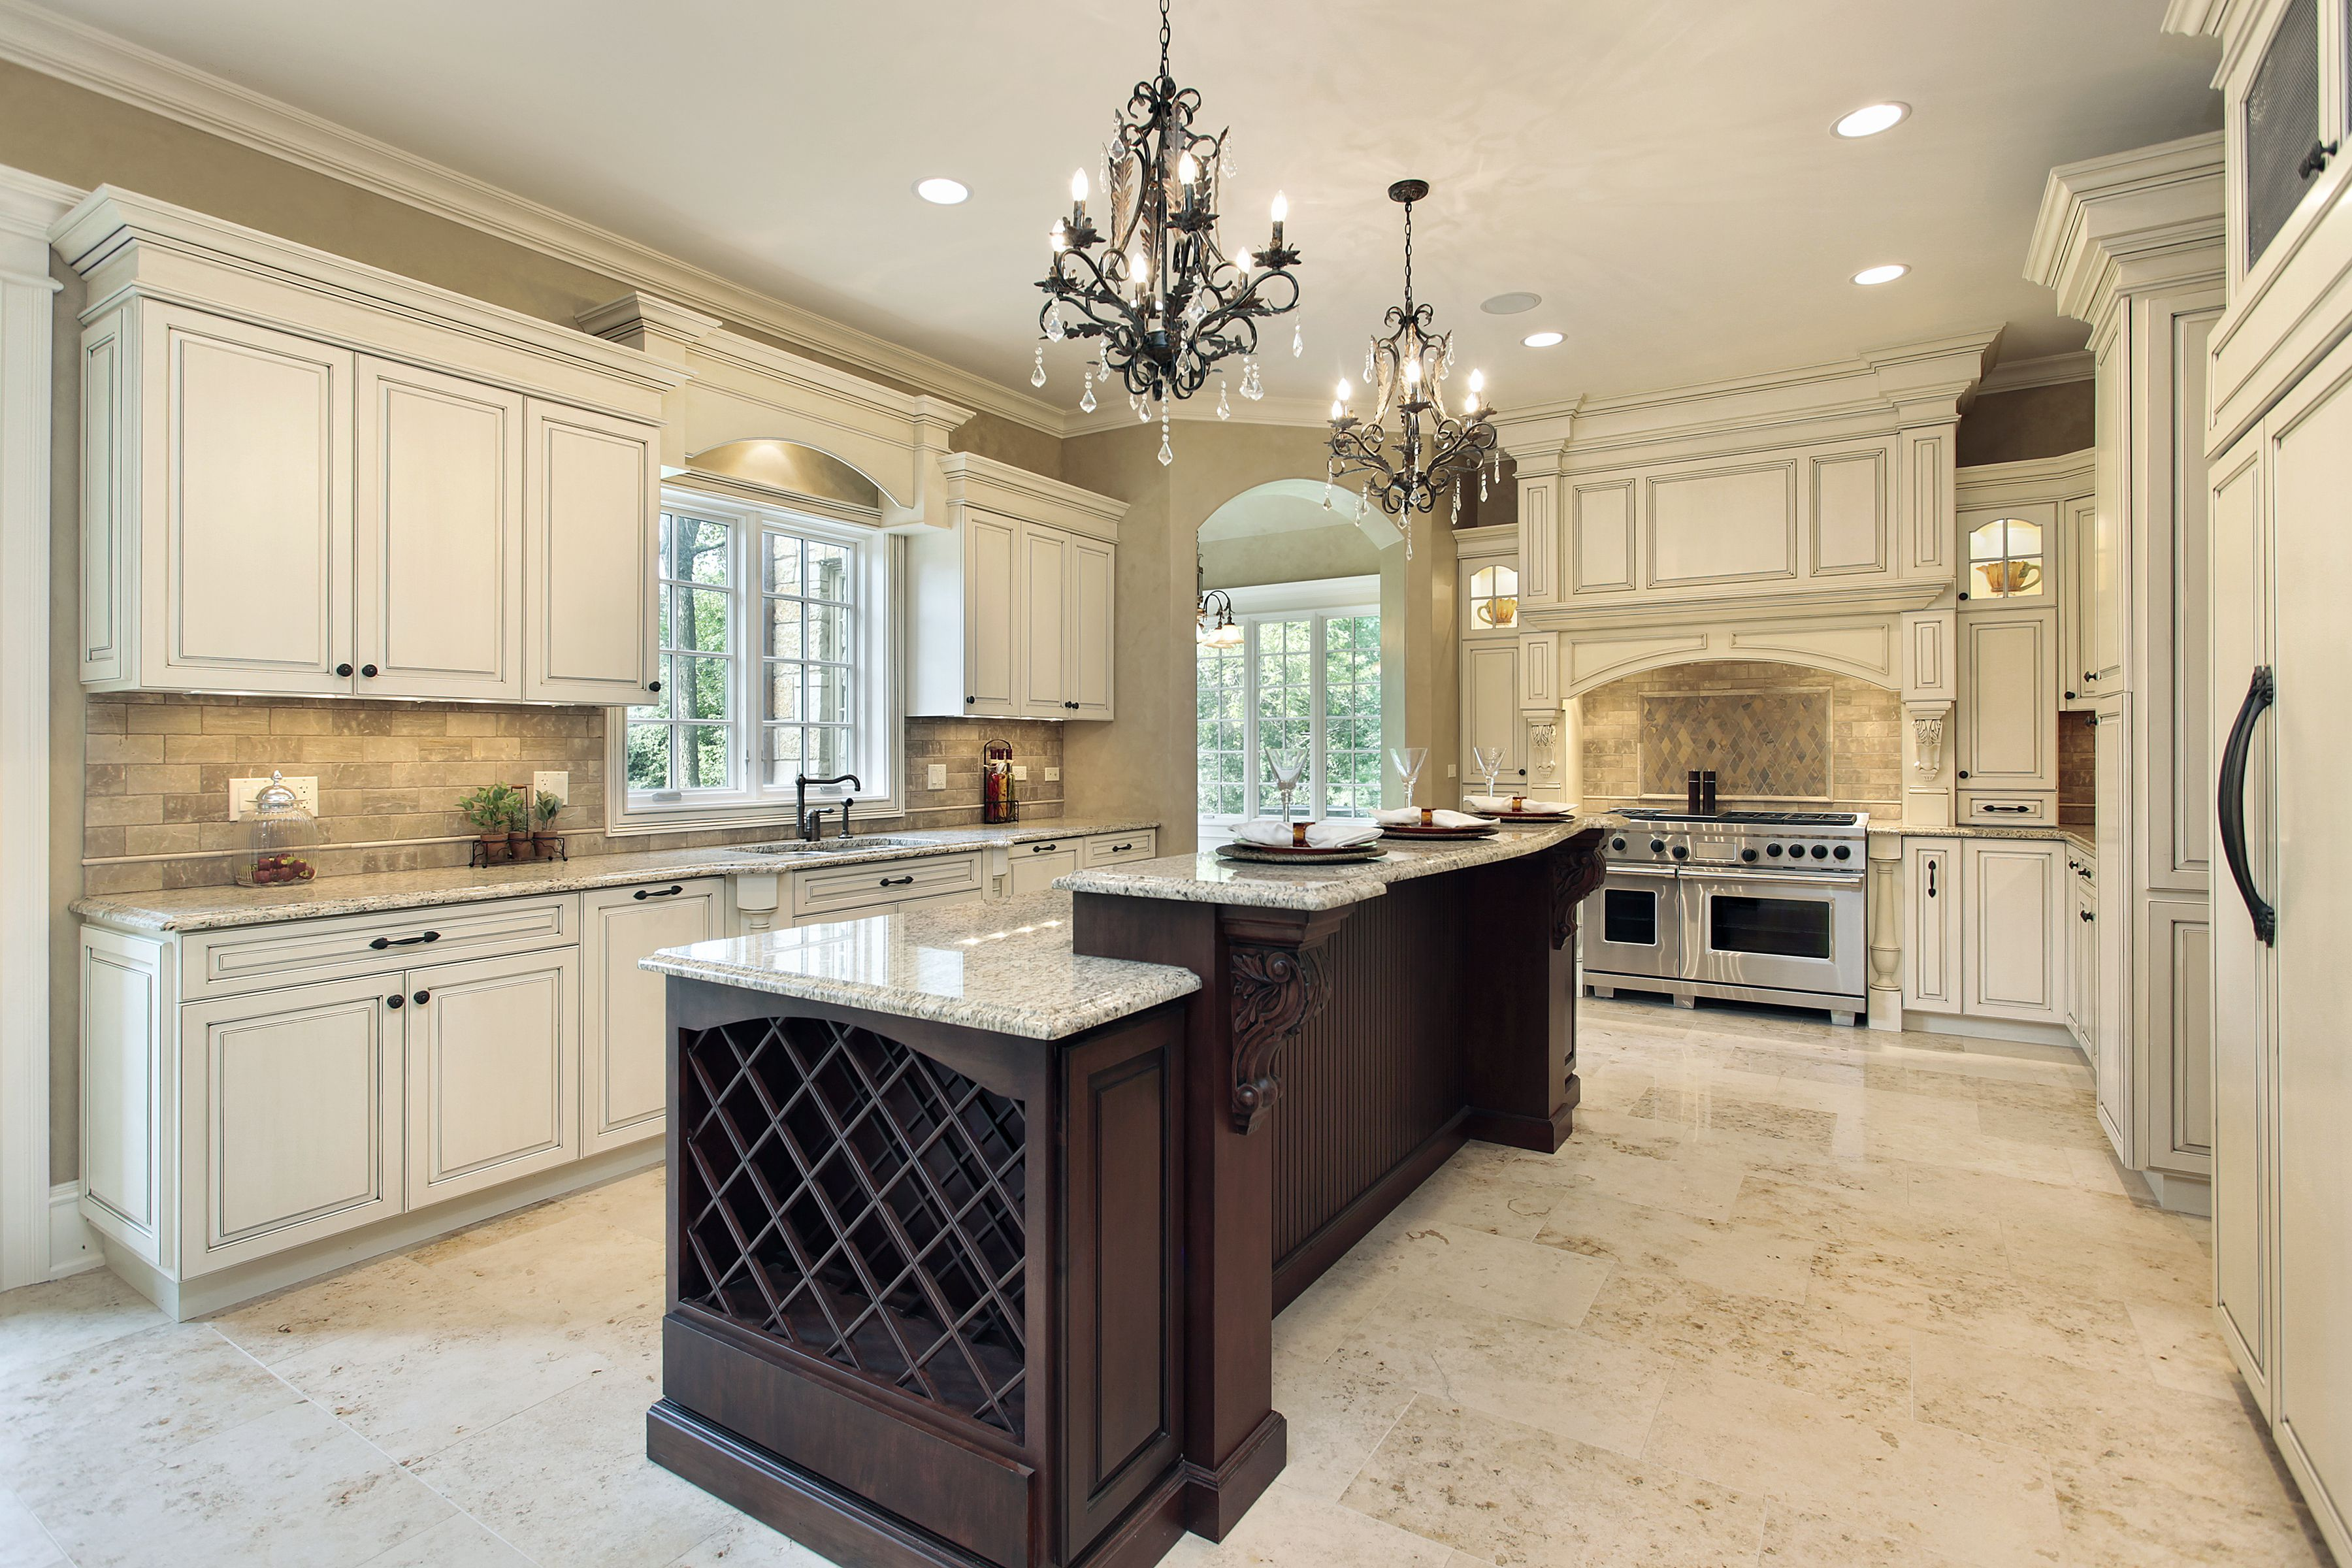 White Kitchen Islands Dinette Set Elegant With Cabinets And Espresso